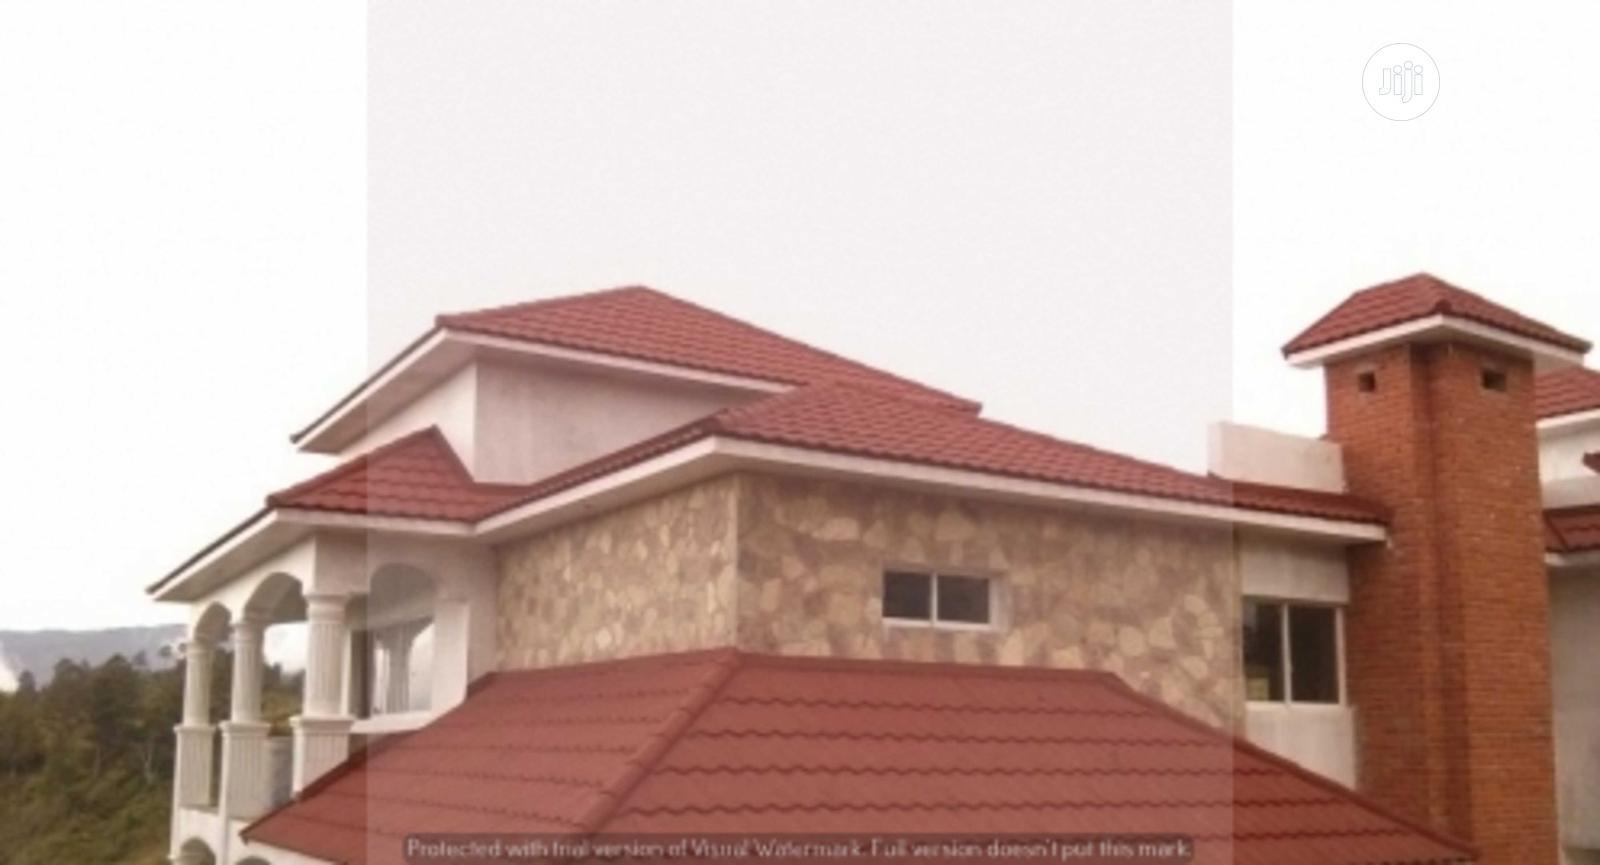 Canada Gerard Koreaheritage Stone Coated Roofing